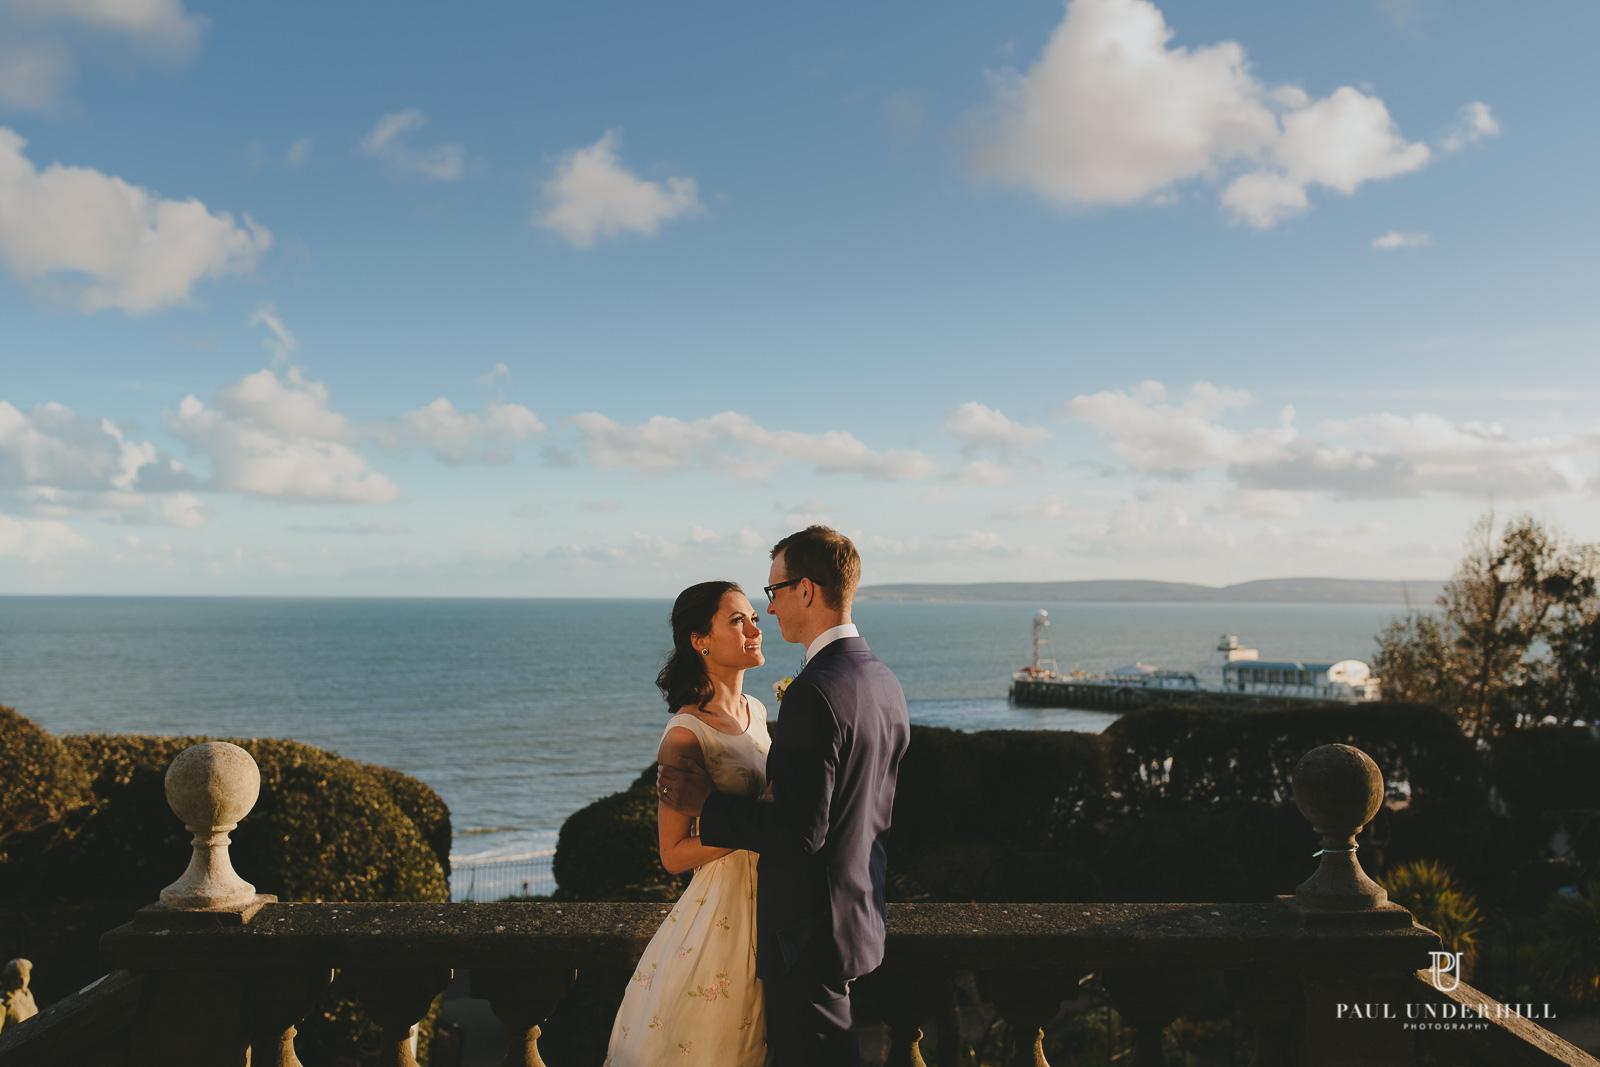 Creative wedding photography portrait